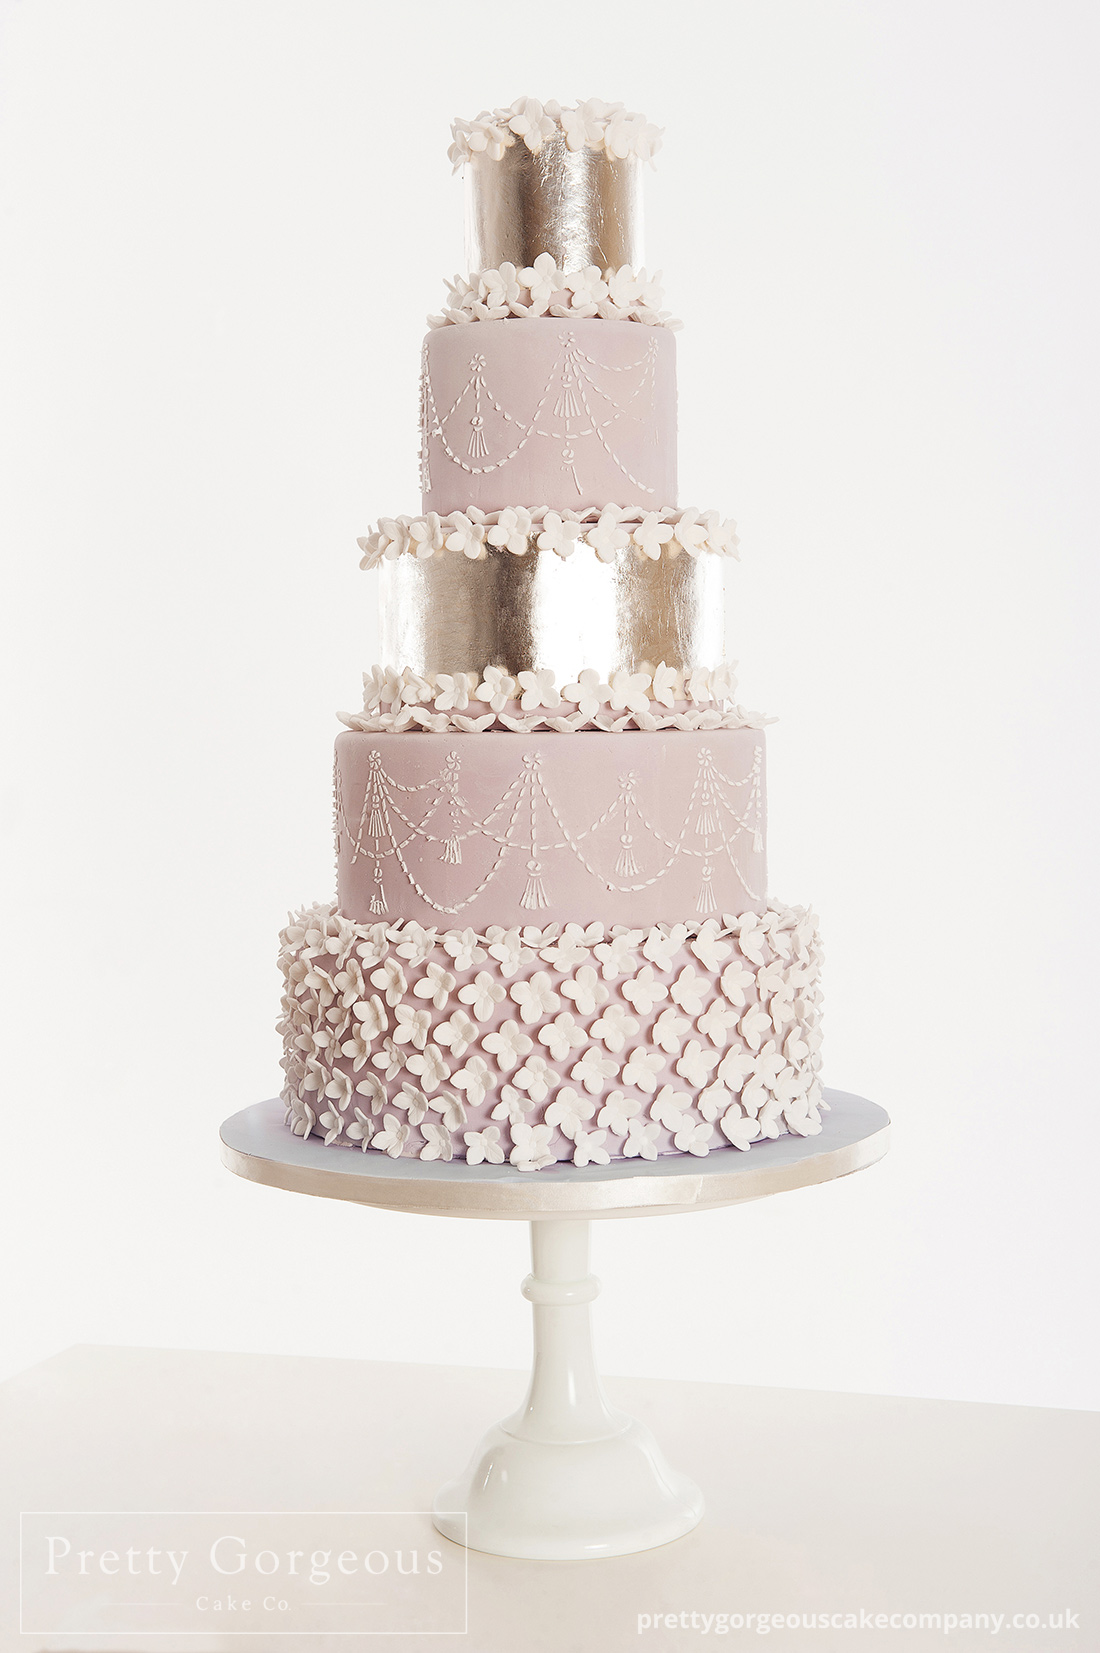 Five 5 tier cake, silver leaf, wedding cake